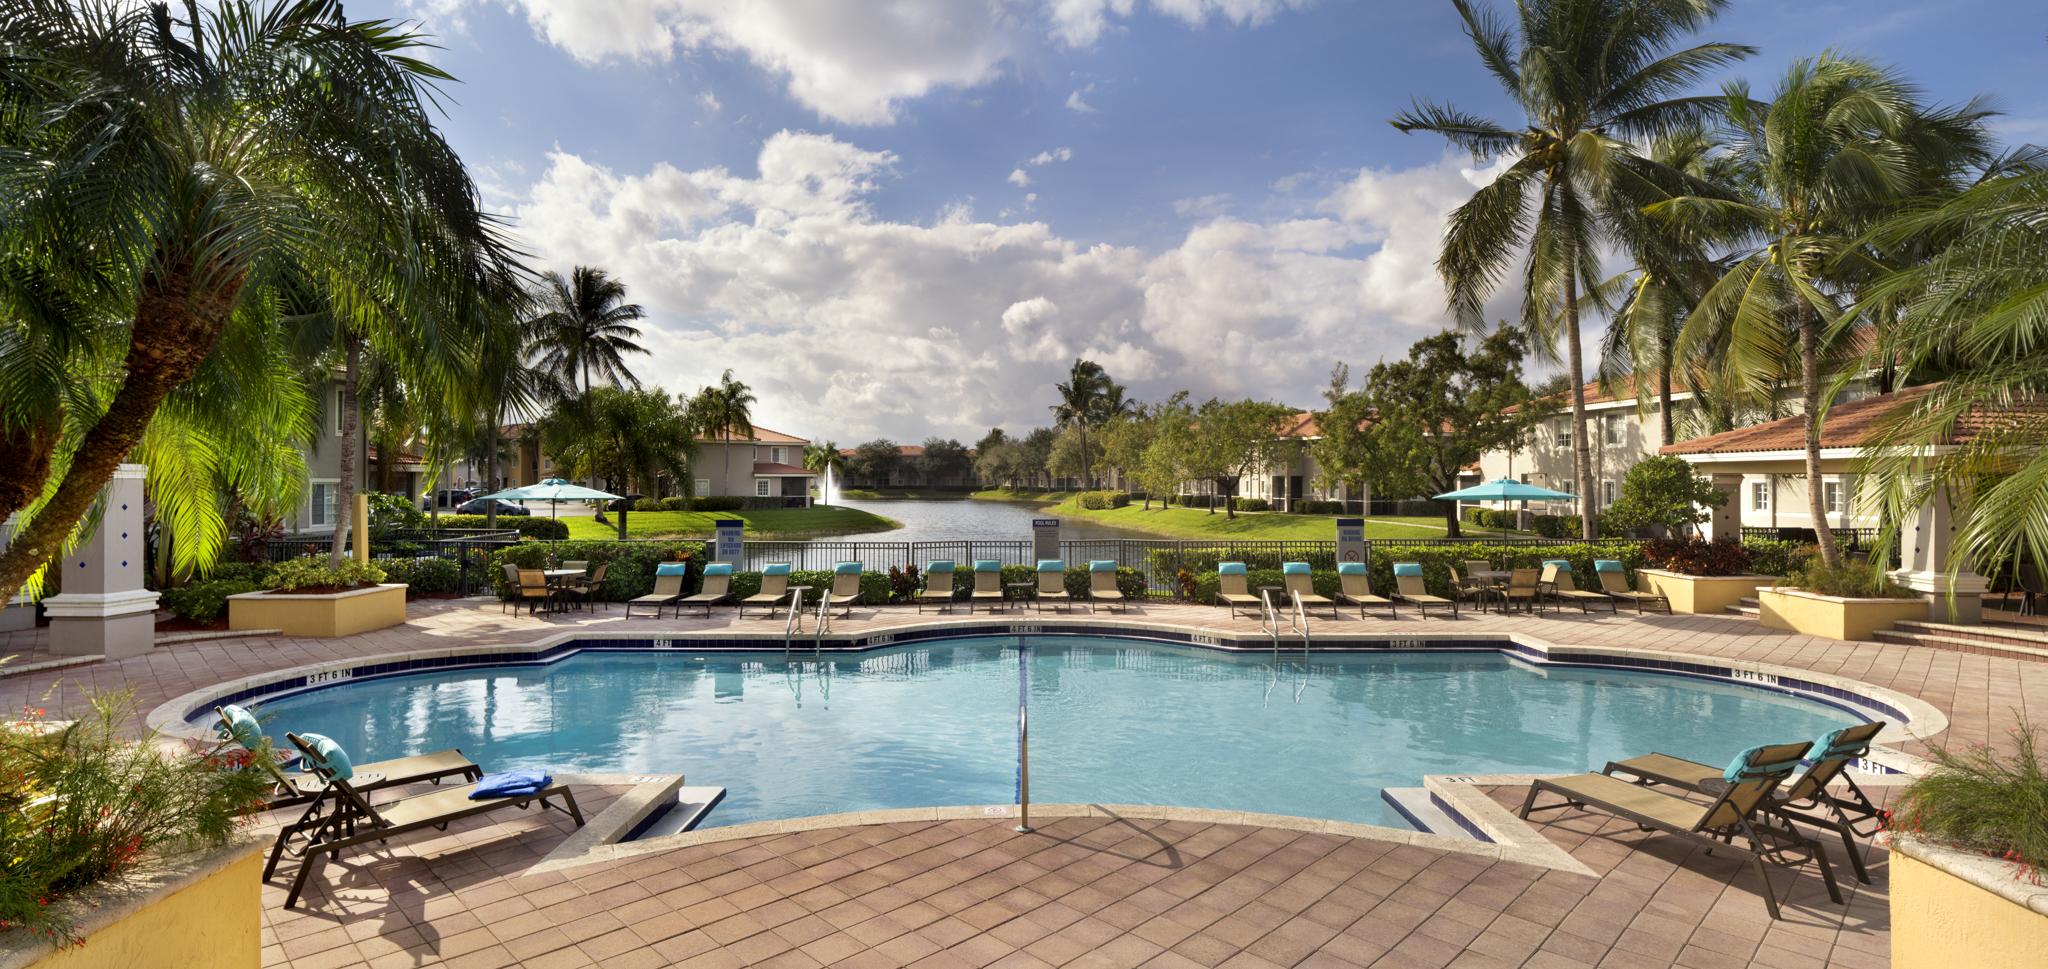 Apartments for Rent in Doral, FL - Camden Doral